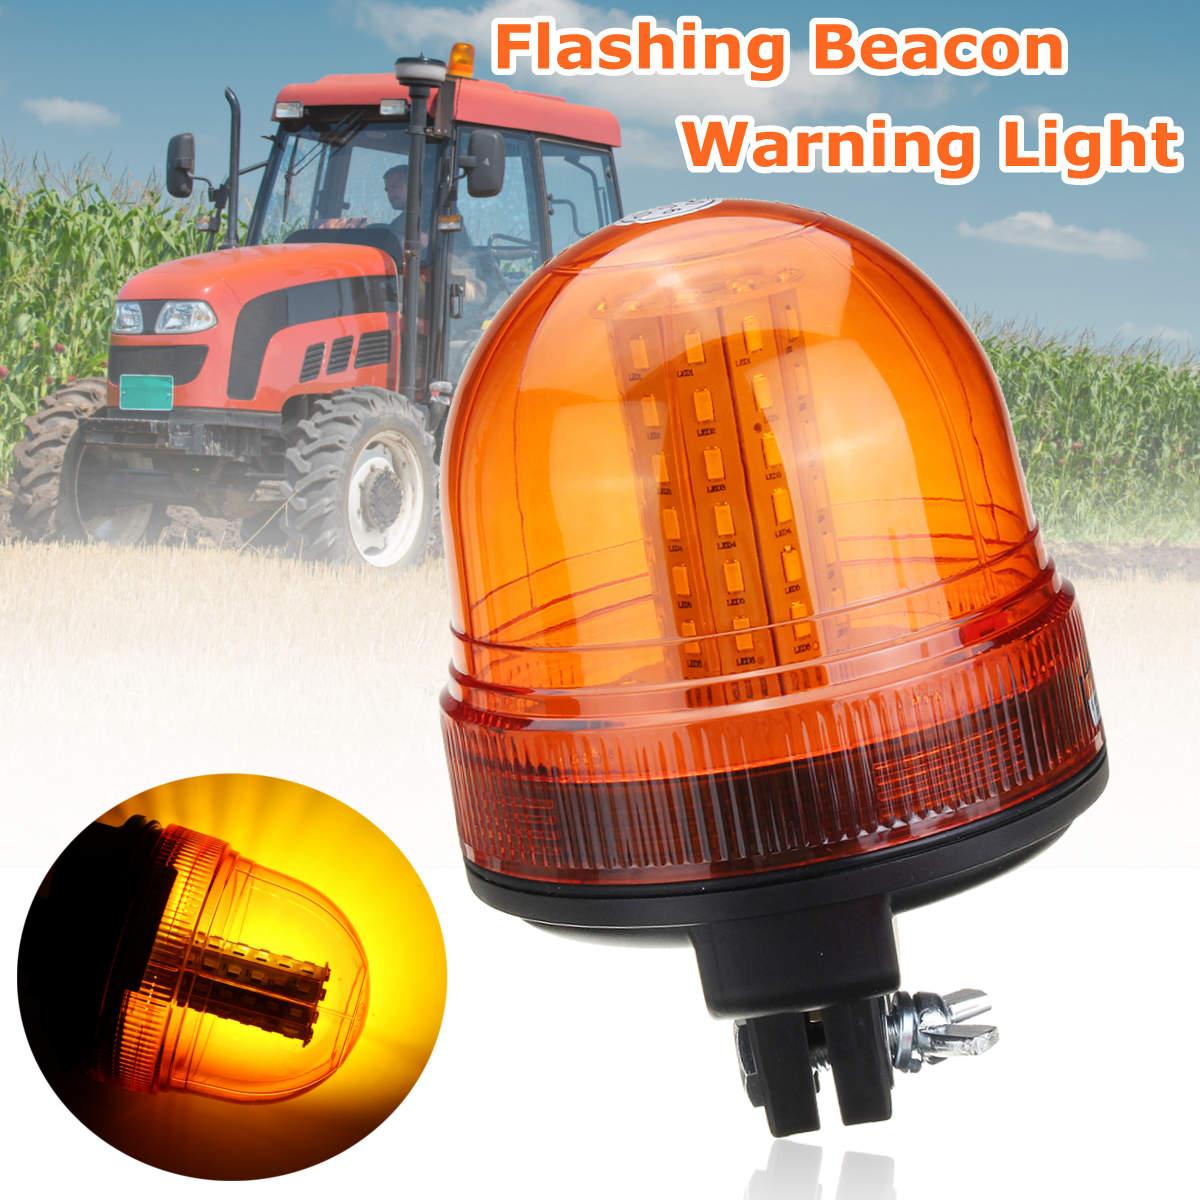 12V/24V 60 SMD5730 LED Rotating Flashing Amber Beacon Flexible DIN Pole Tractor Warning Light